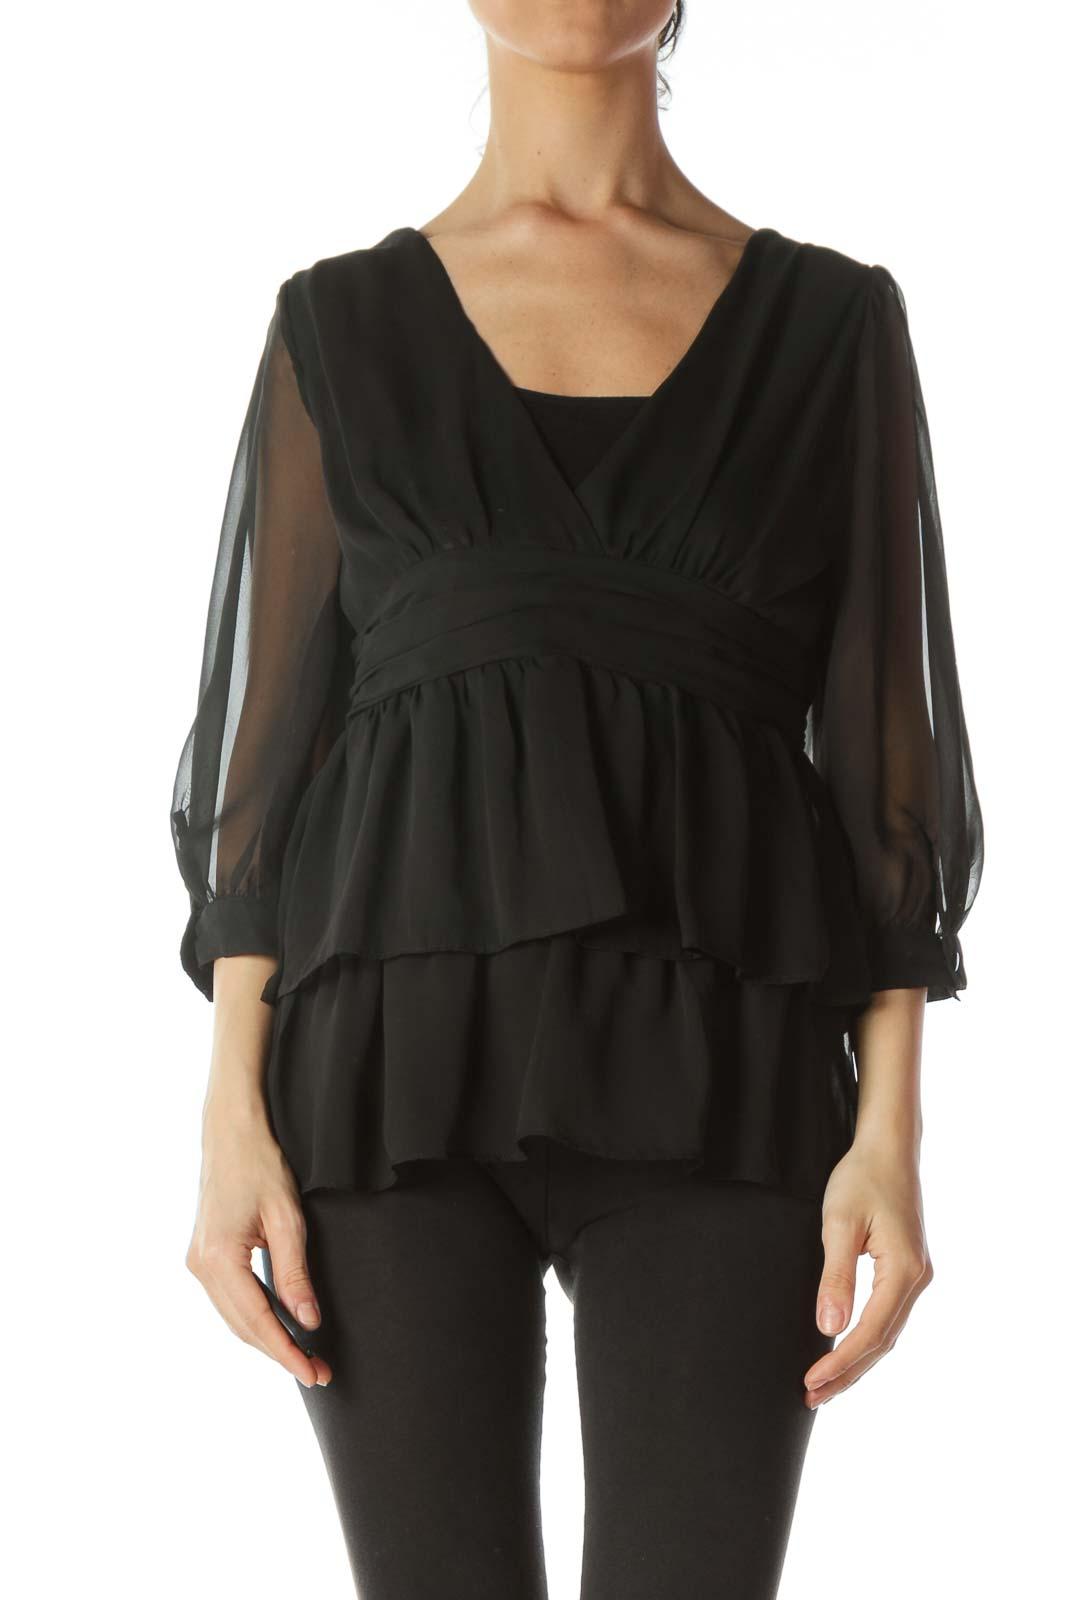 Black Chiffon See-Through Long-Sleeve Blouse Front